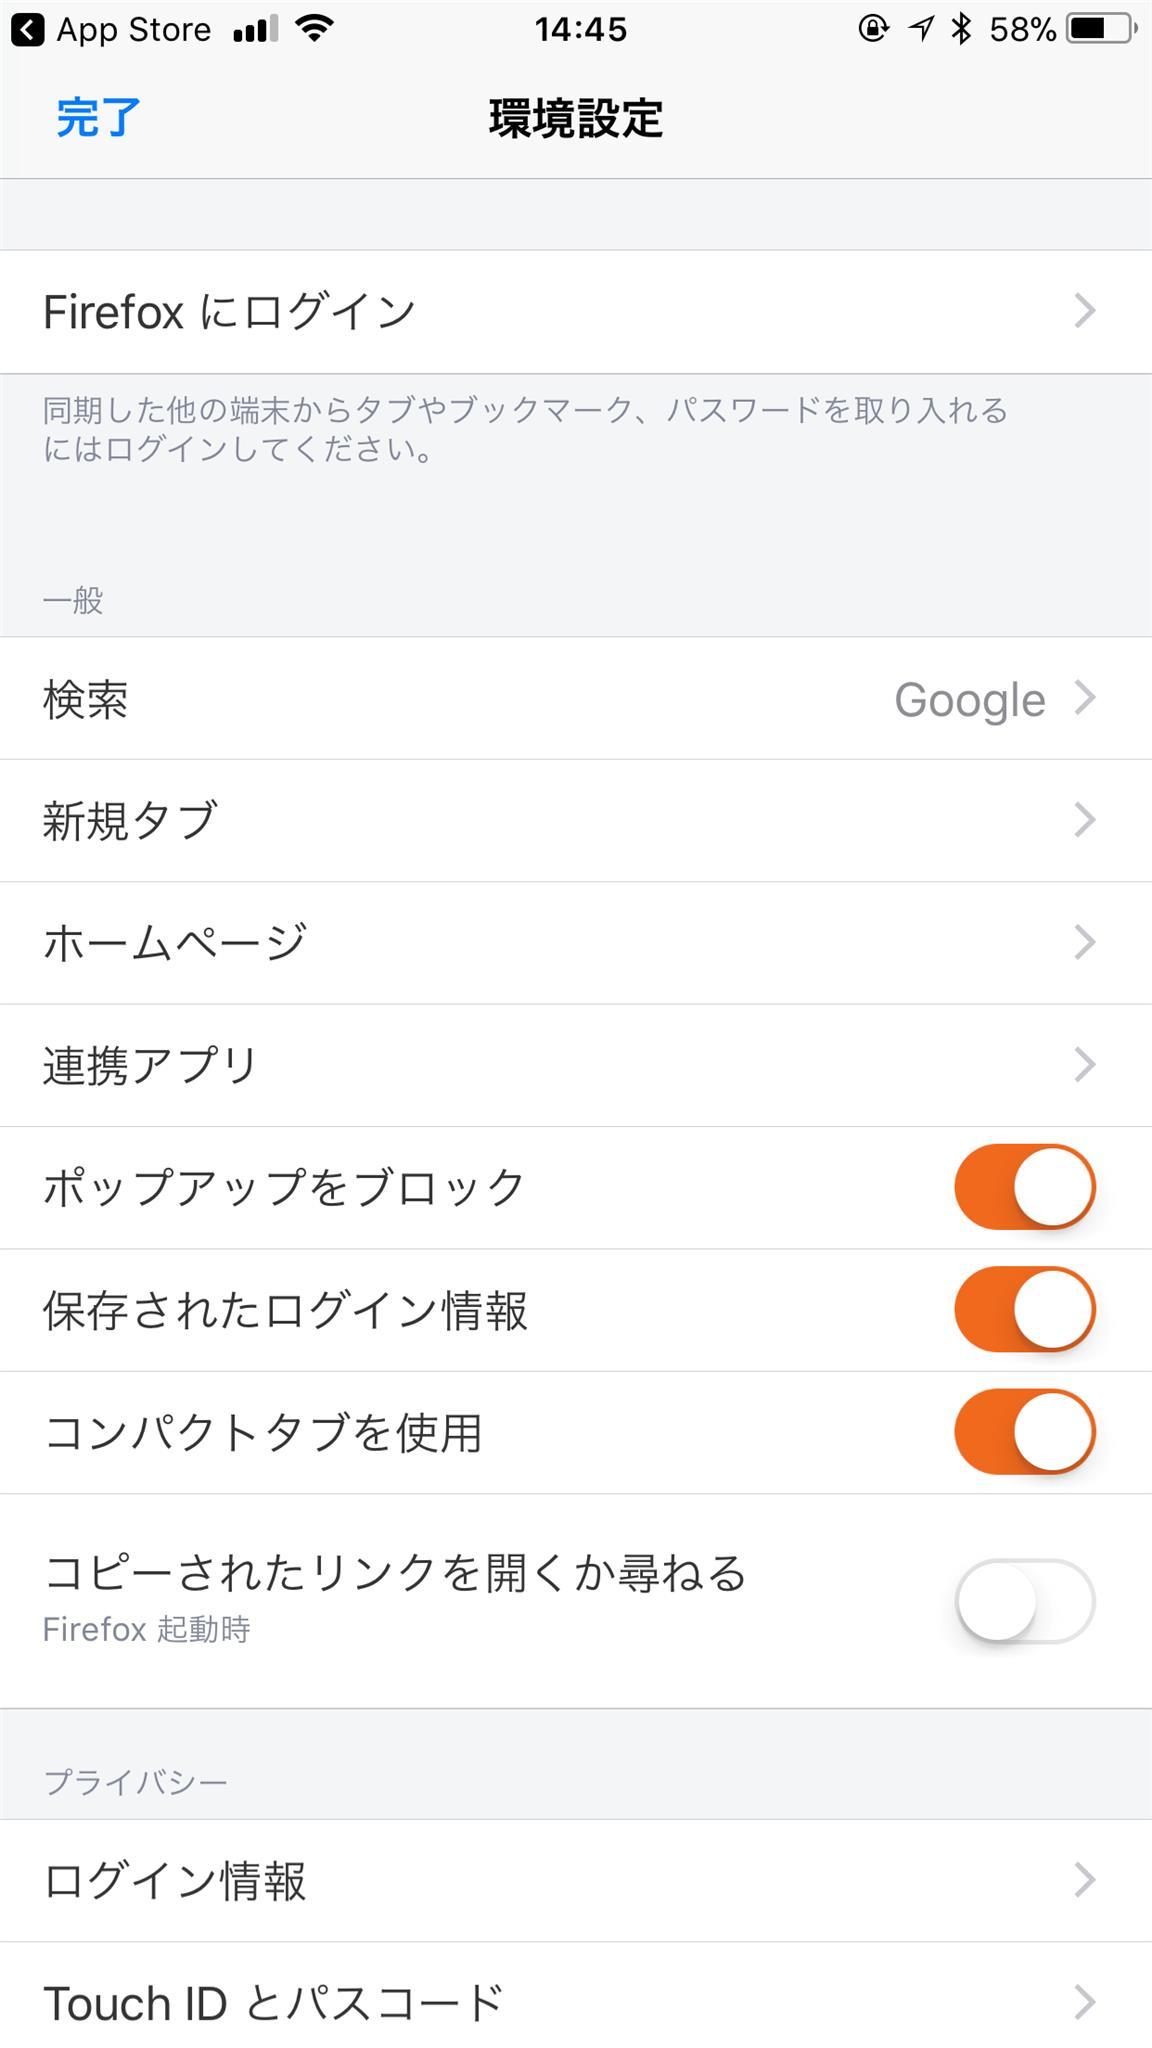 iOS版「Firefox」ではプライバシー保護を強化